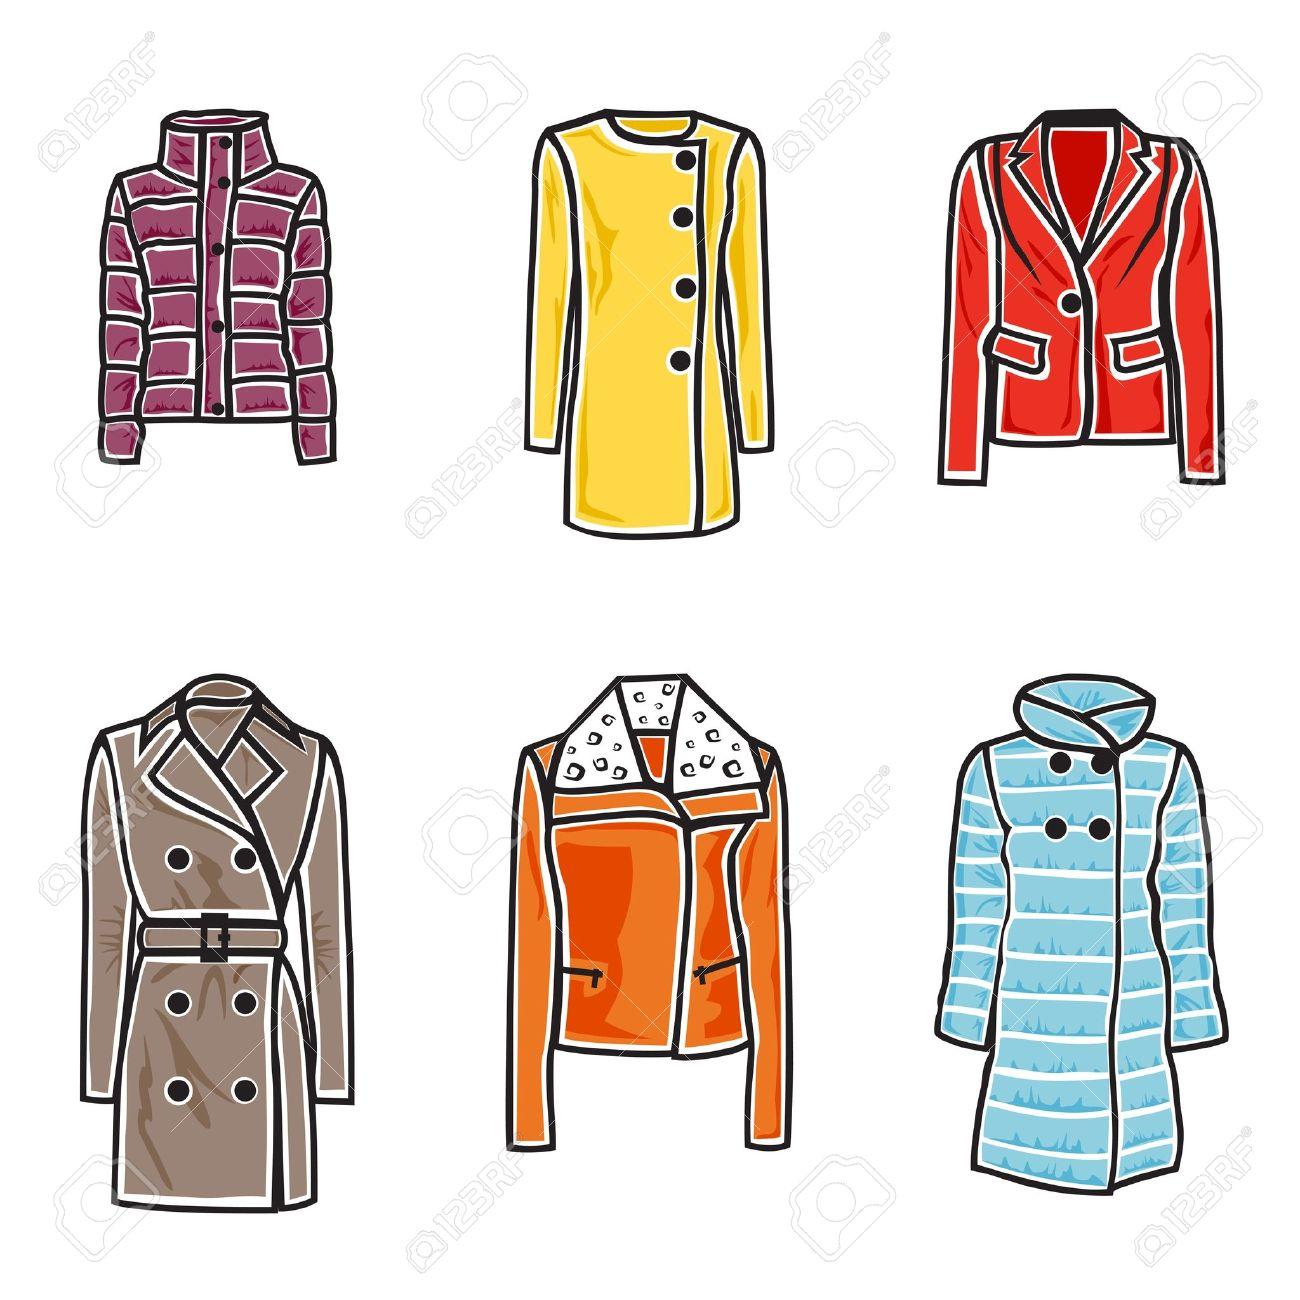 illustration of women coats on white background Stock Vector - 15868505